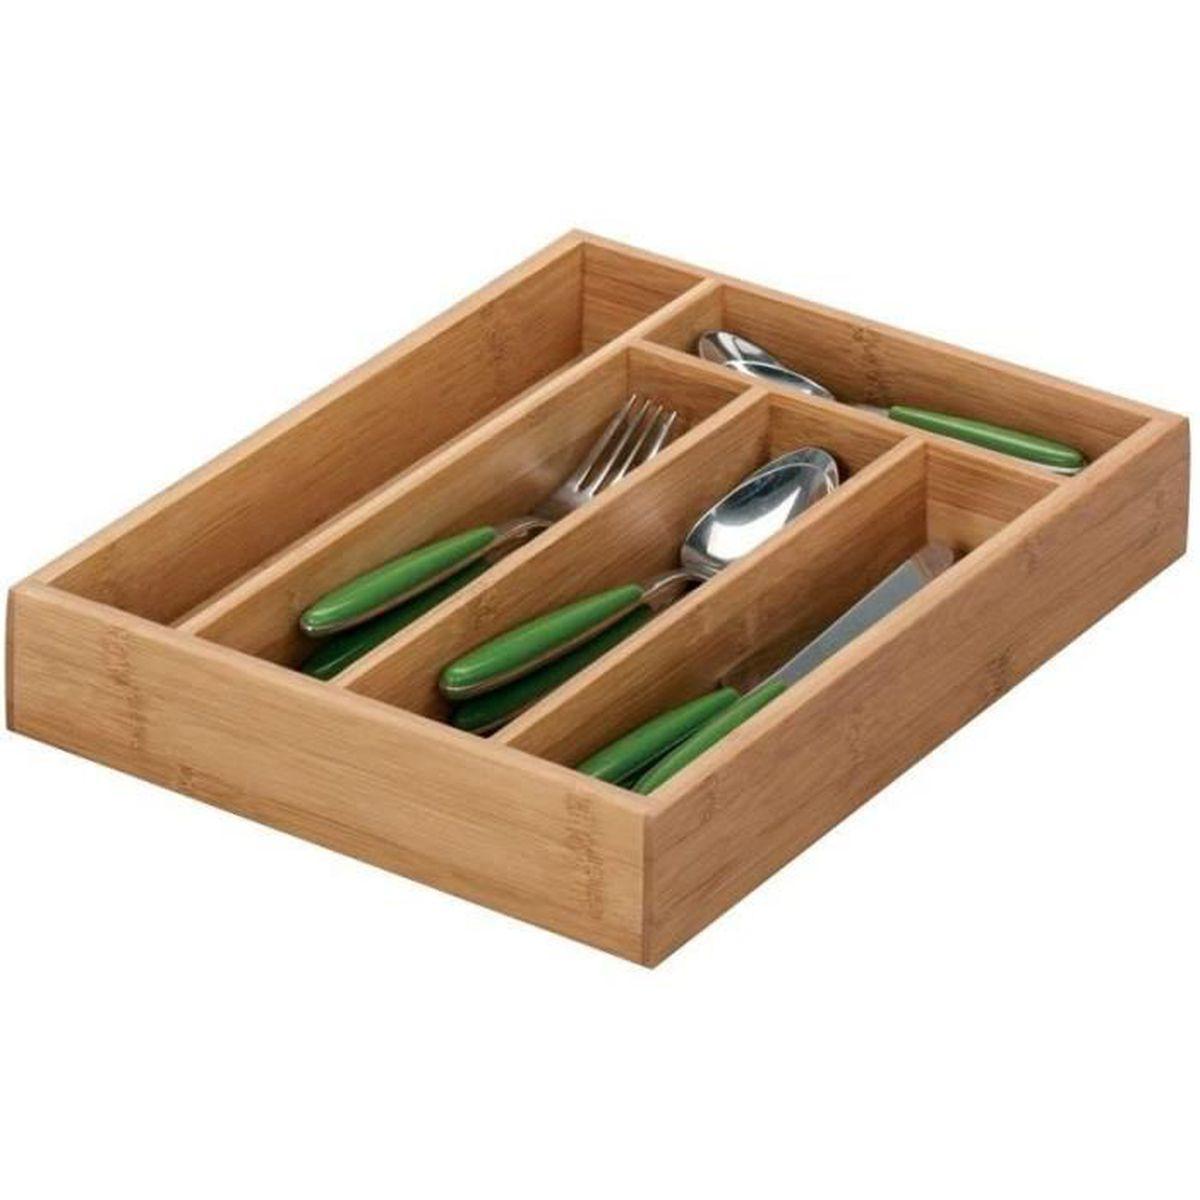 Boite à couvert en bambou – range couverts pour tiroir ...